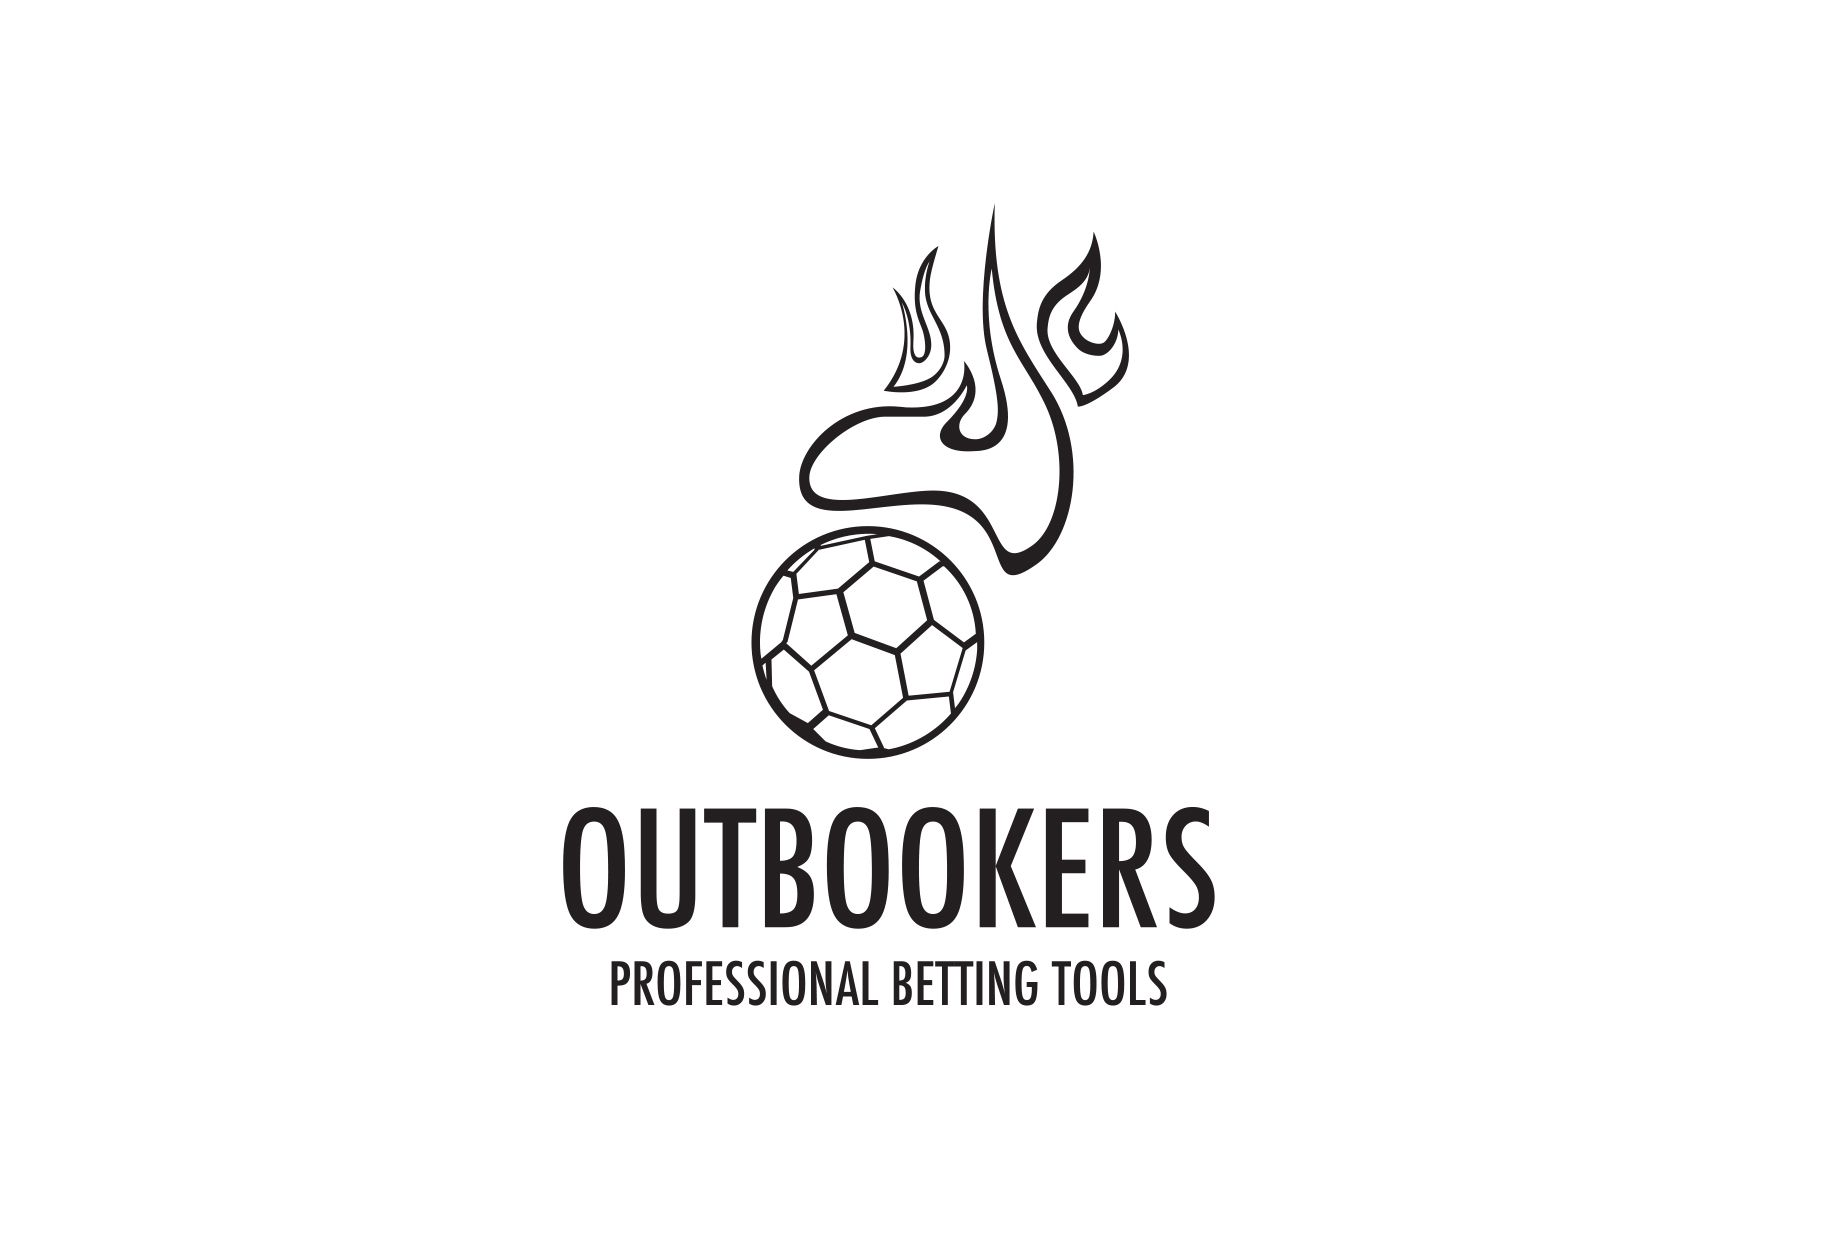 Логотип для компании (спортивная аналитика) - дизайнер linagrin